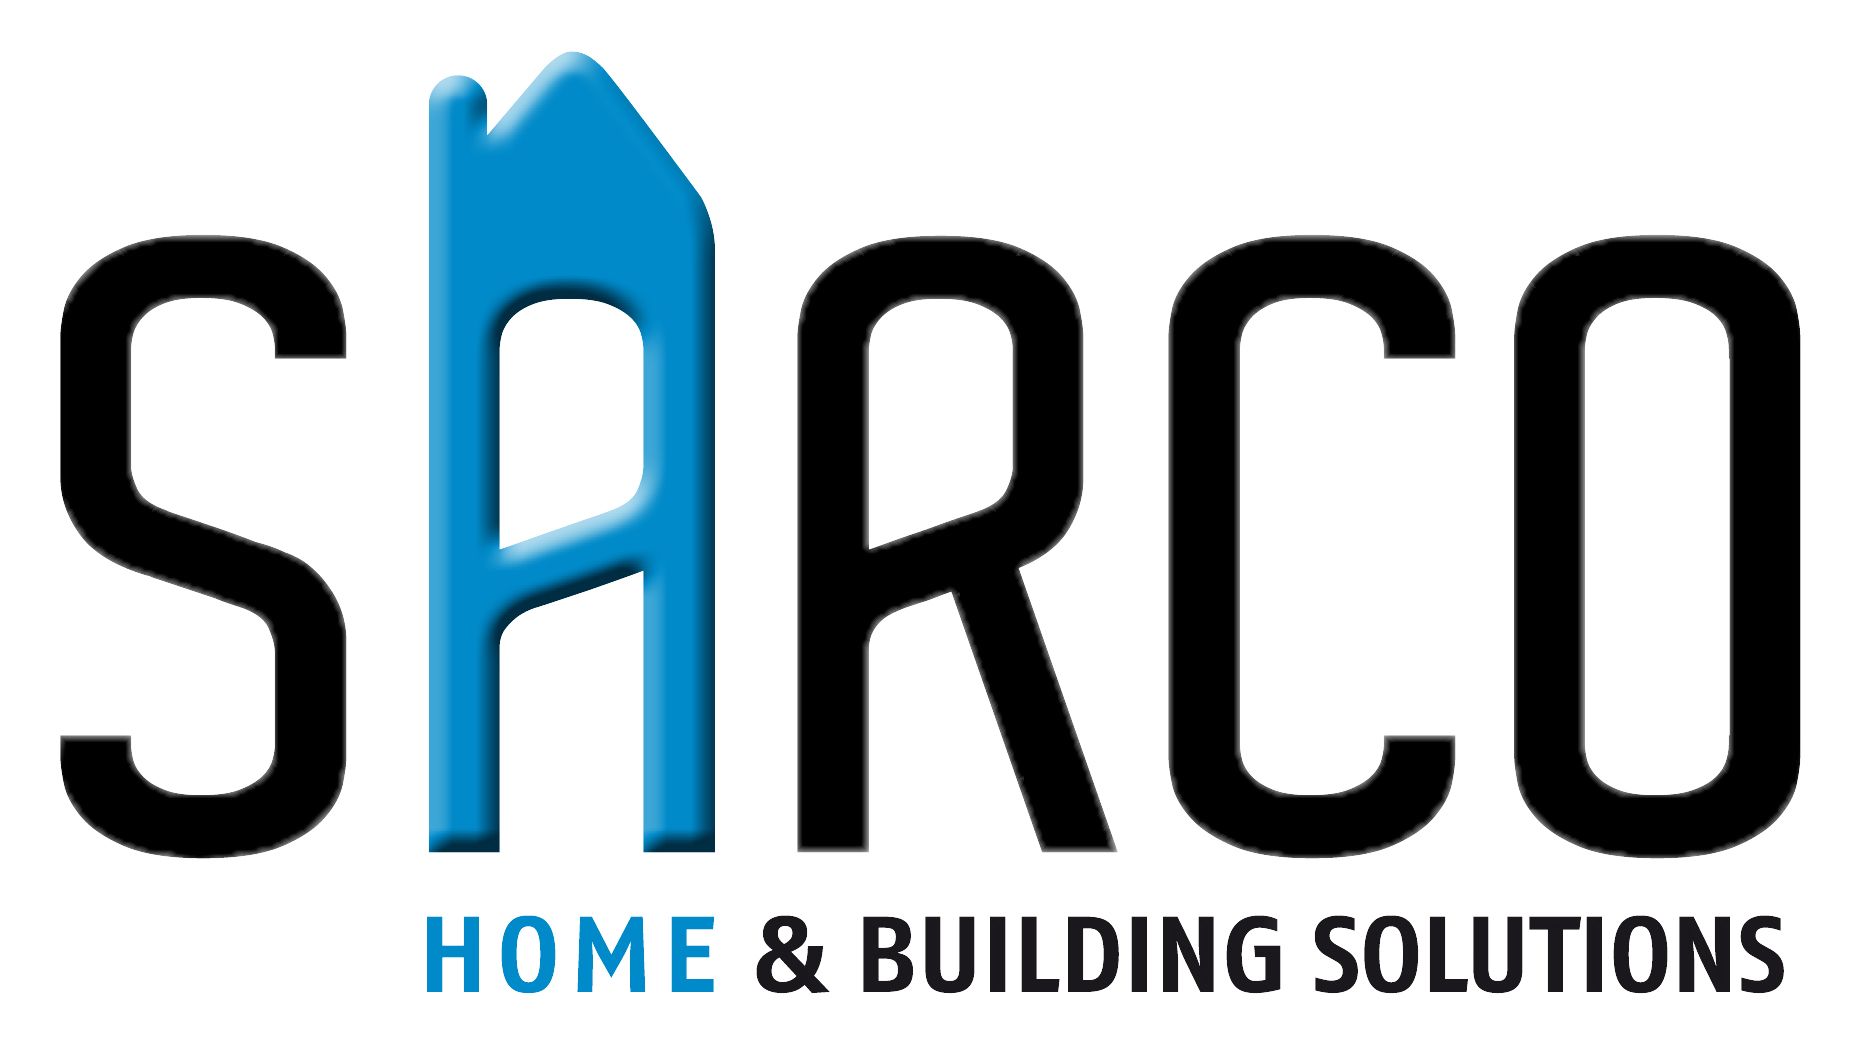 Sarco_home building ISOLATO 2